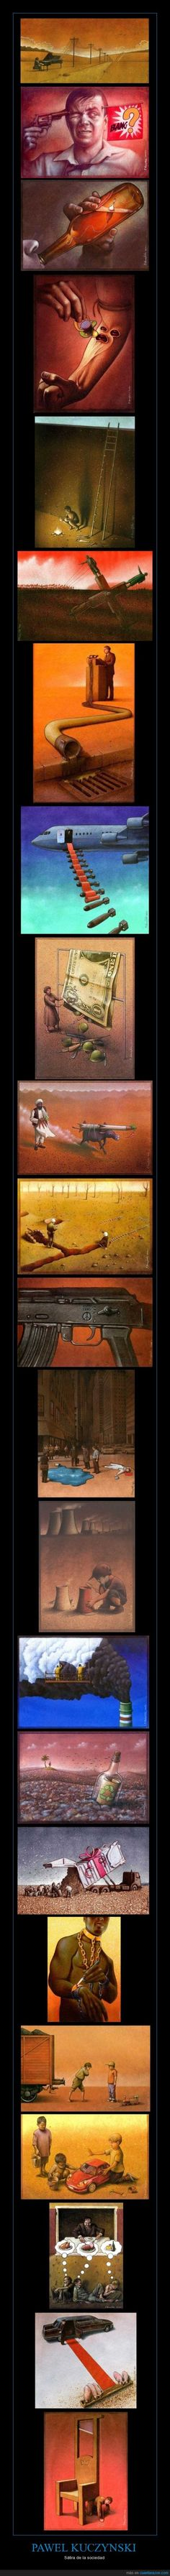 PAWEL KUCZYNSKI - Sátira de la sociedad